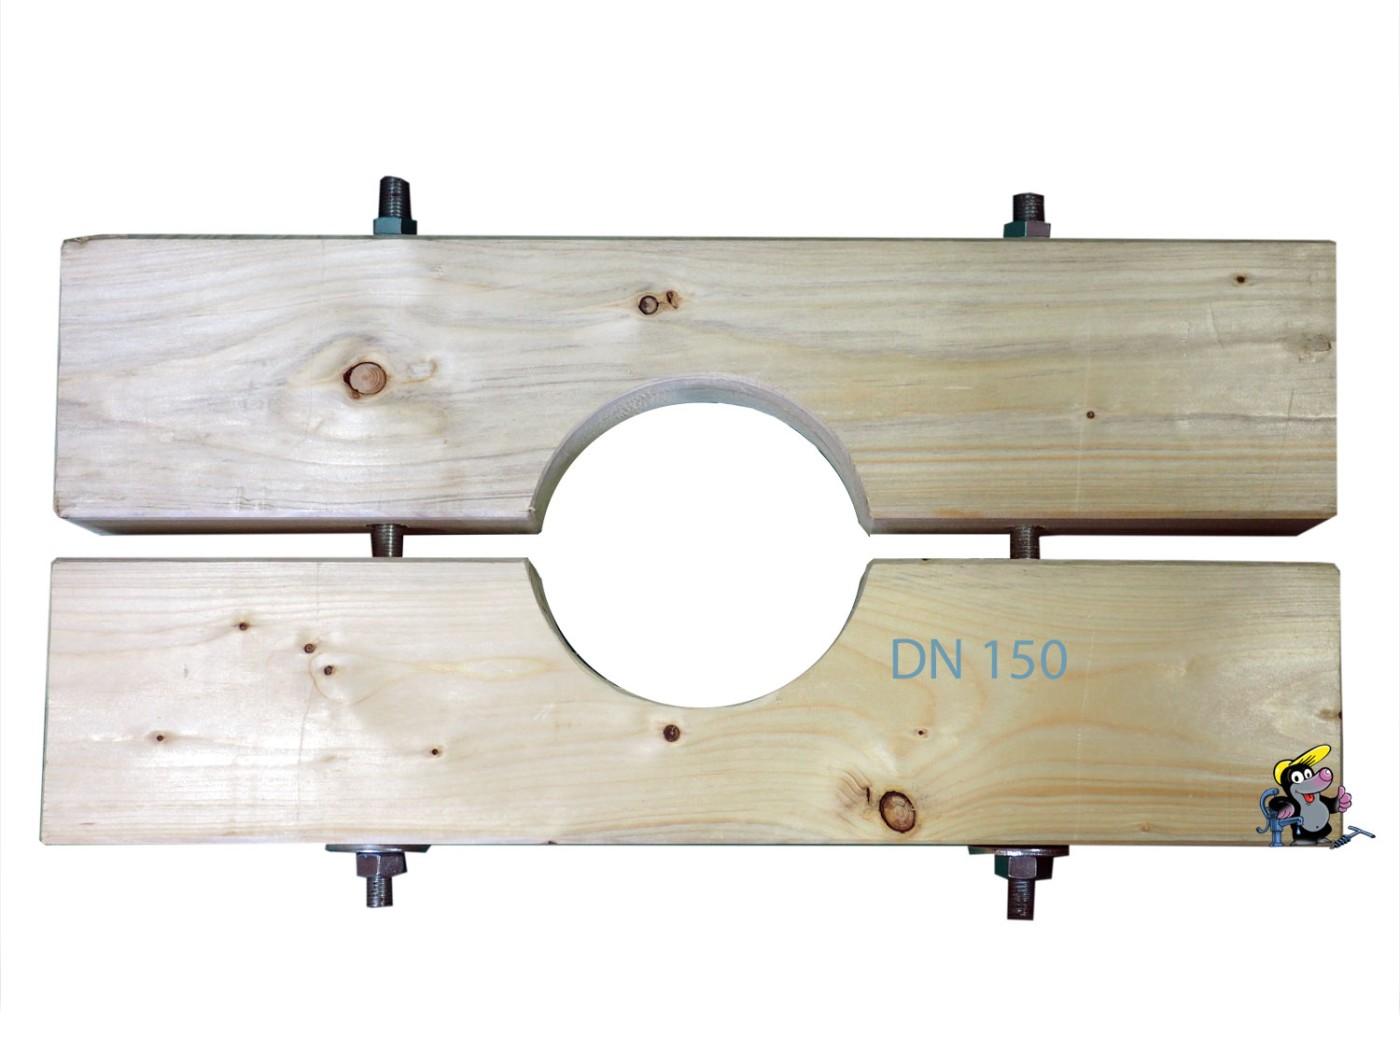 Klemme Aus Holz Zum Plunschen Dn150 165mm